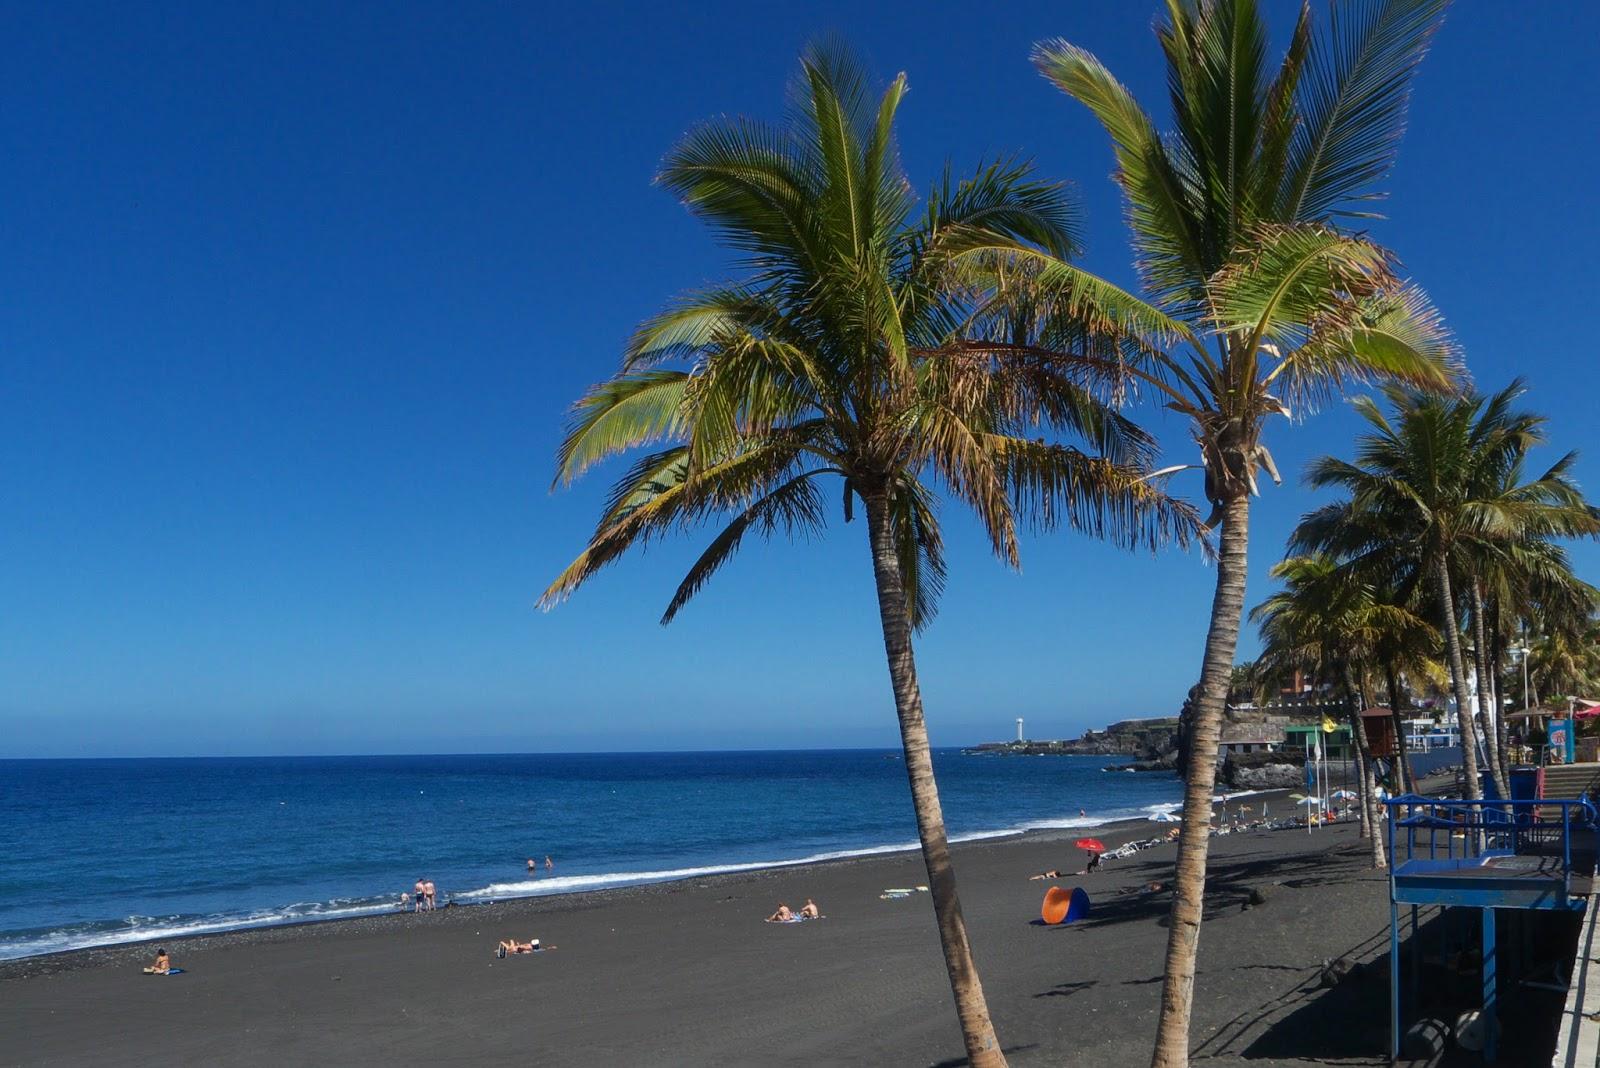 Reasons to visit La Palma